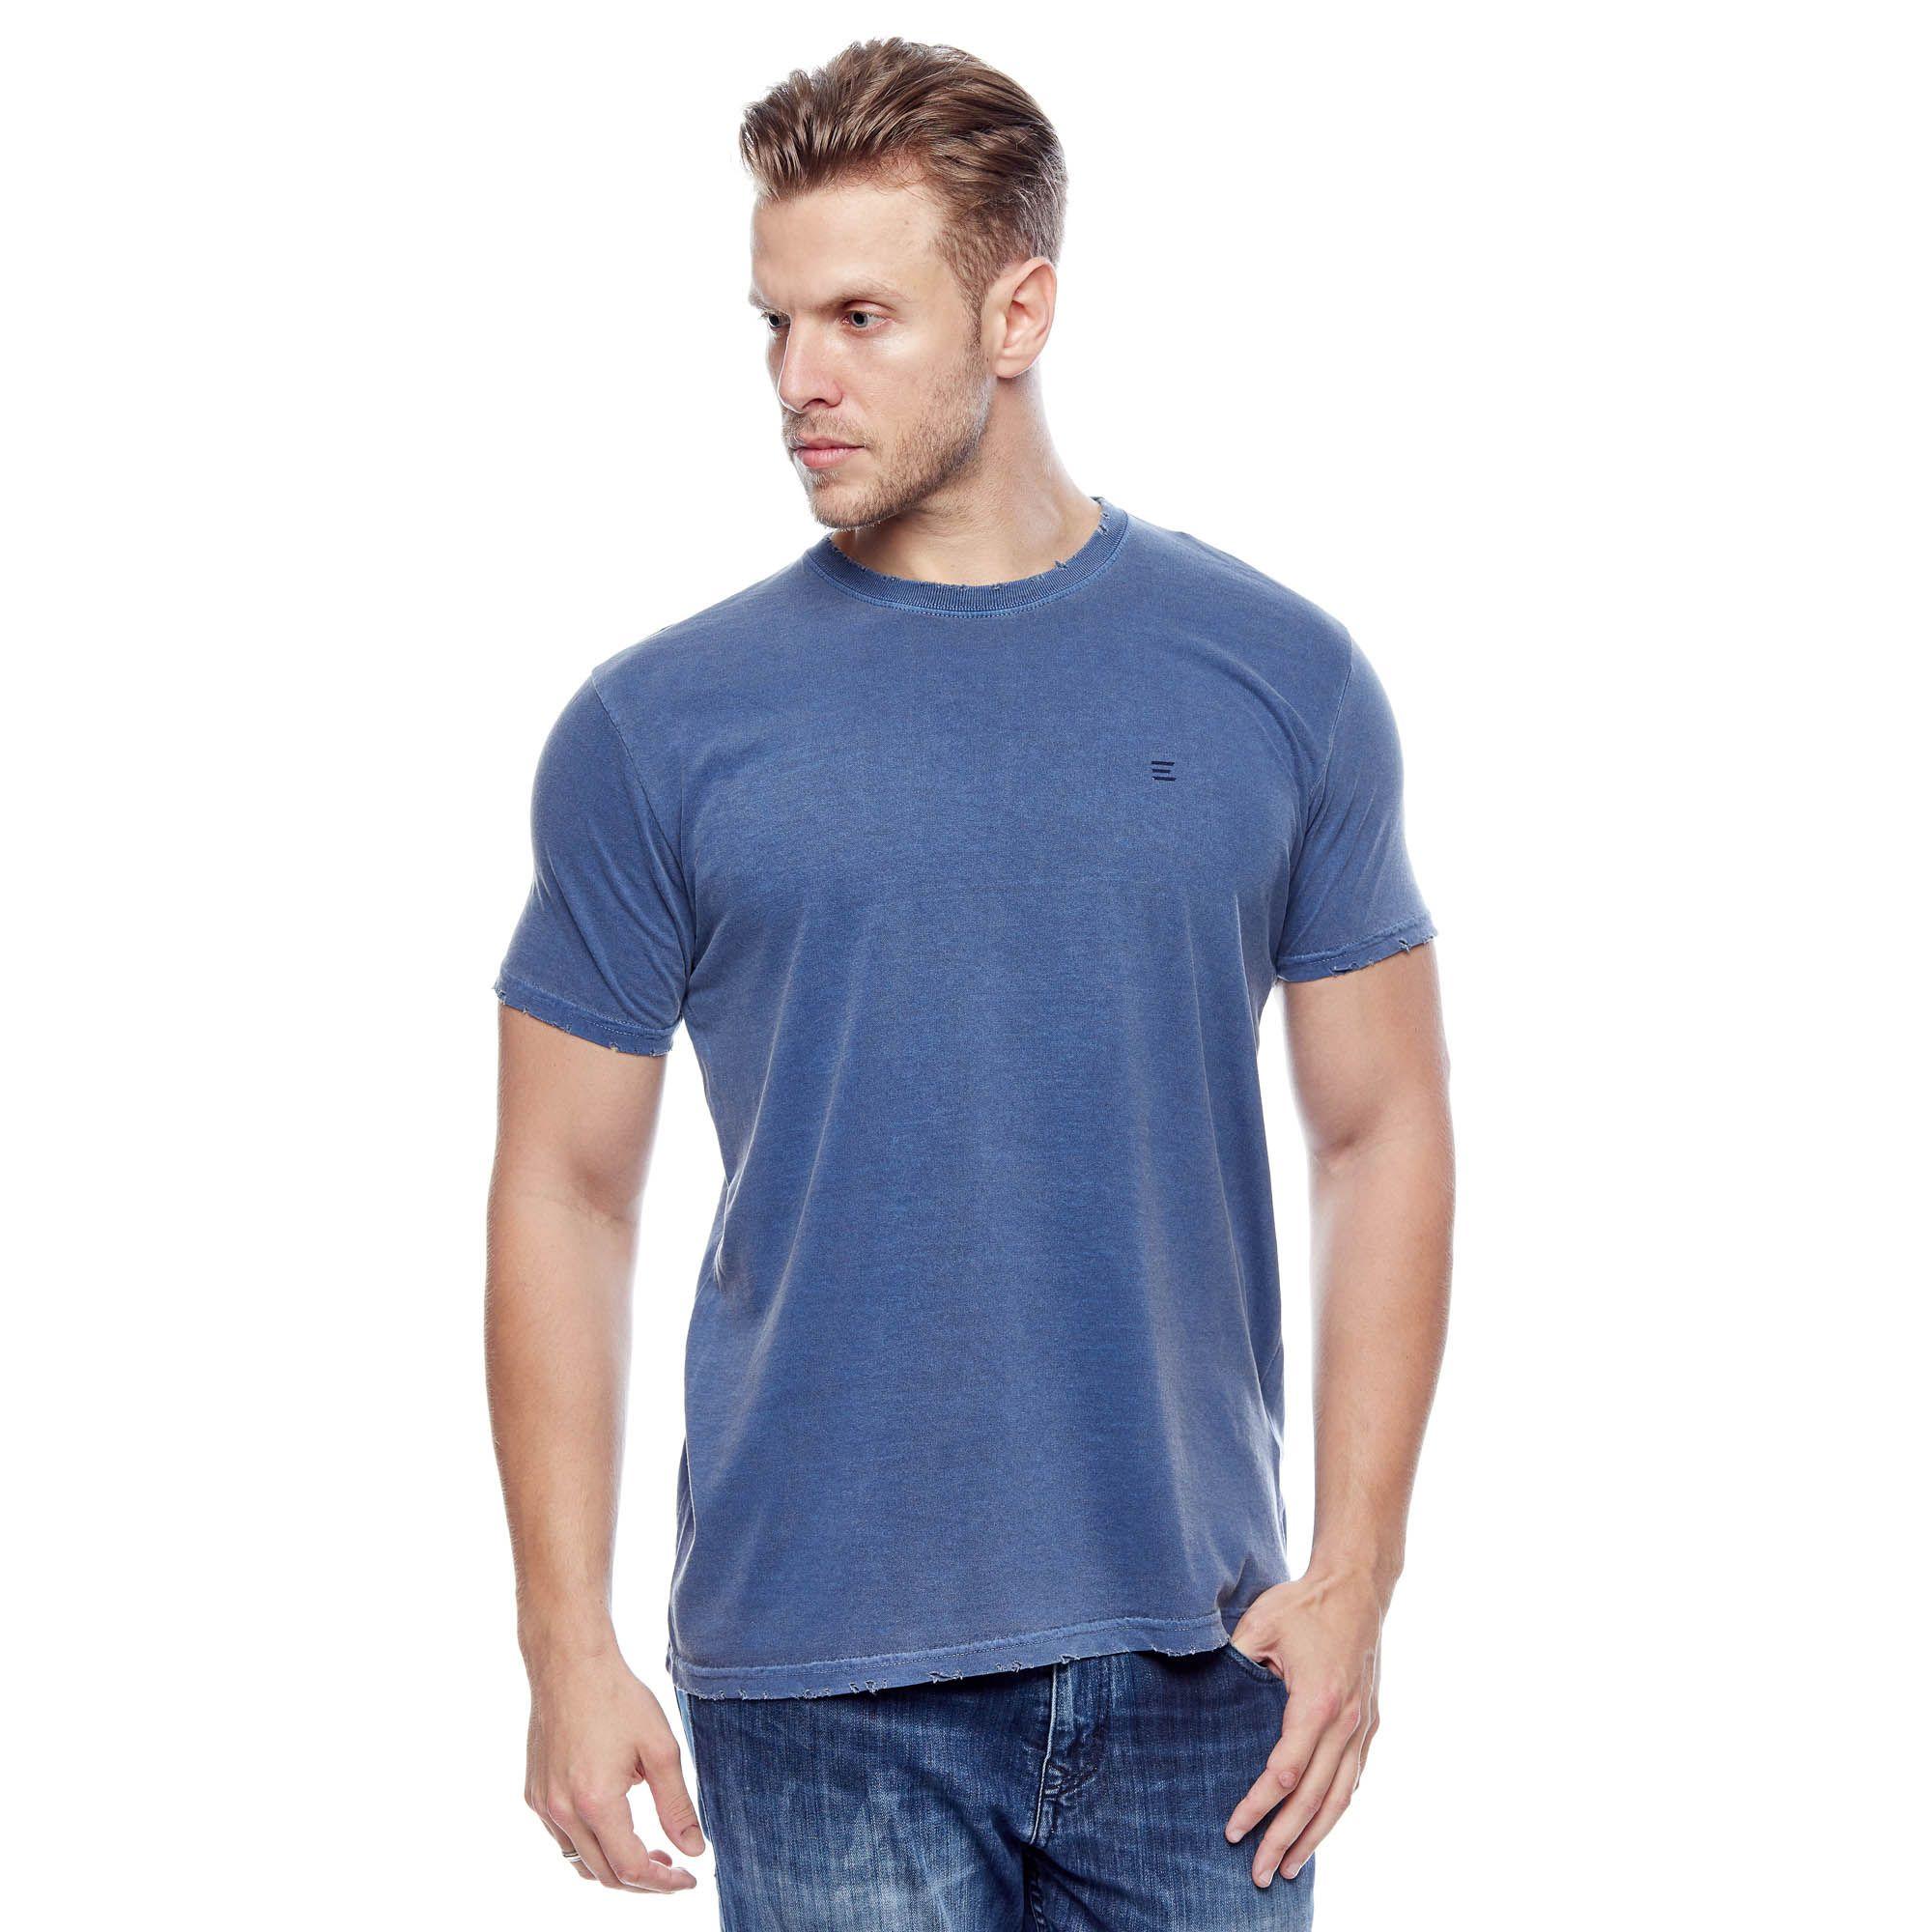 Camiseta Evolvee Básica Destroyer Masculina